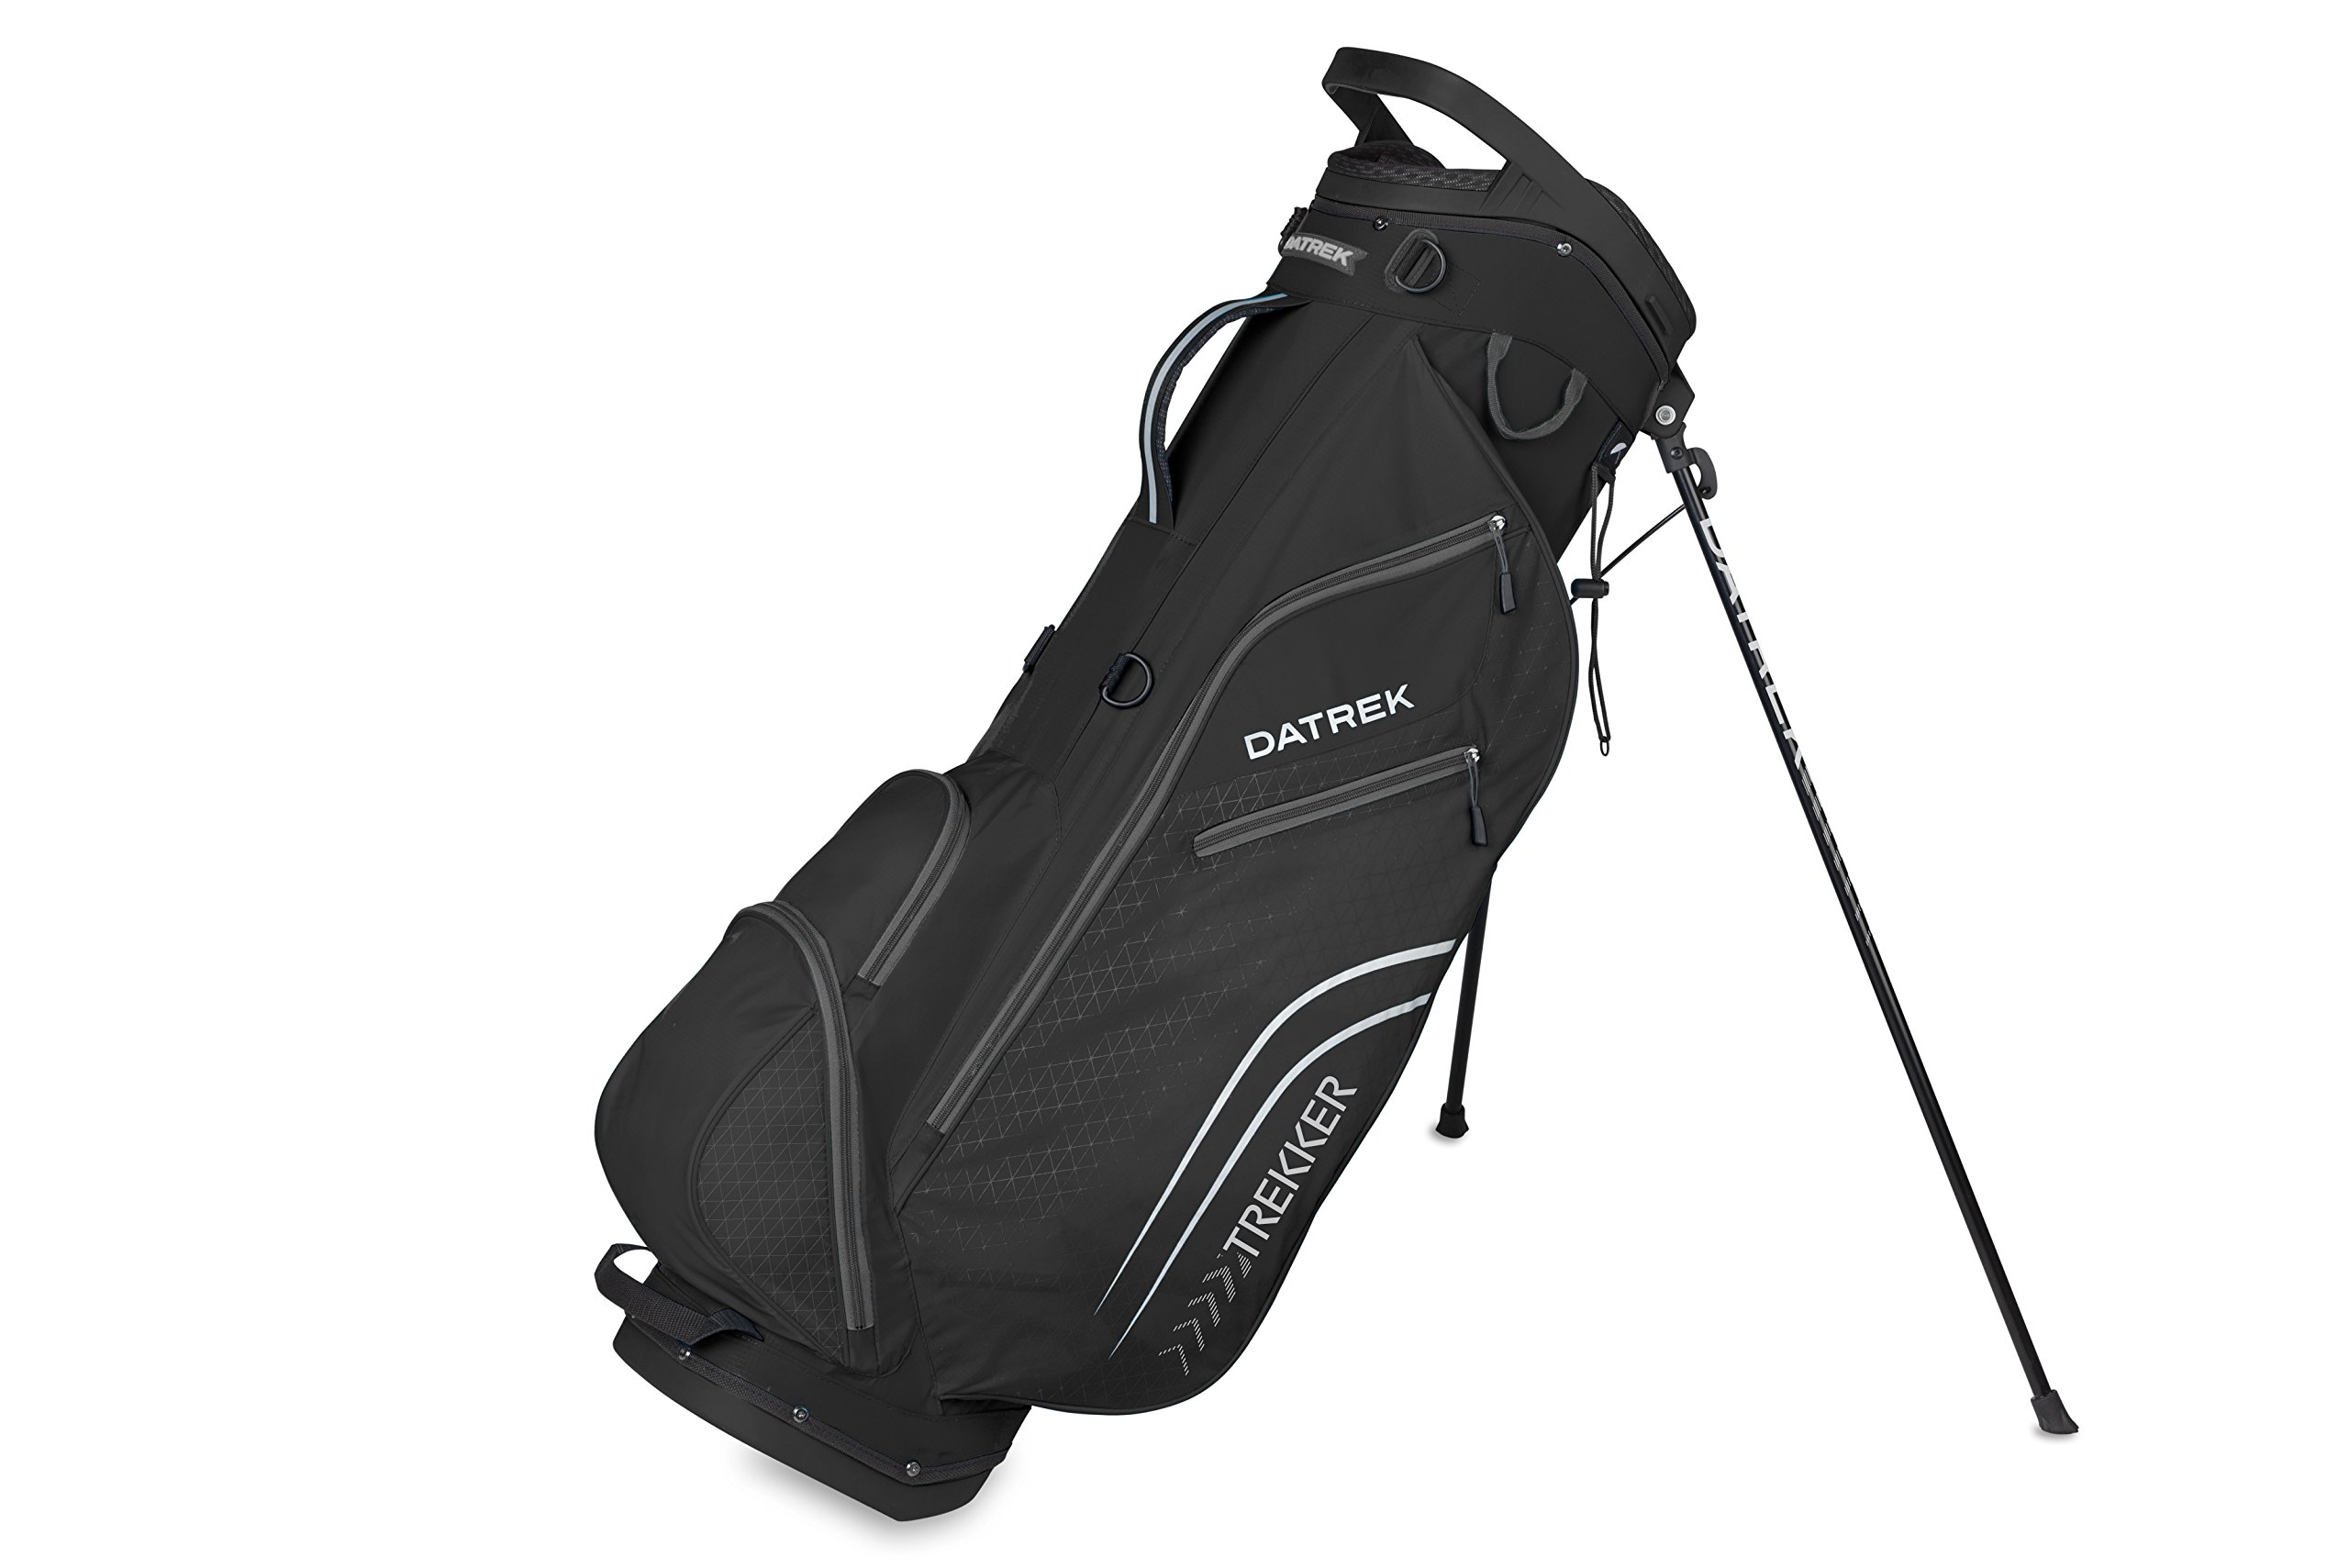 Datrek Golf Trekker Ultra Lite Stand Bag (Black/Charcoal)